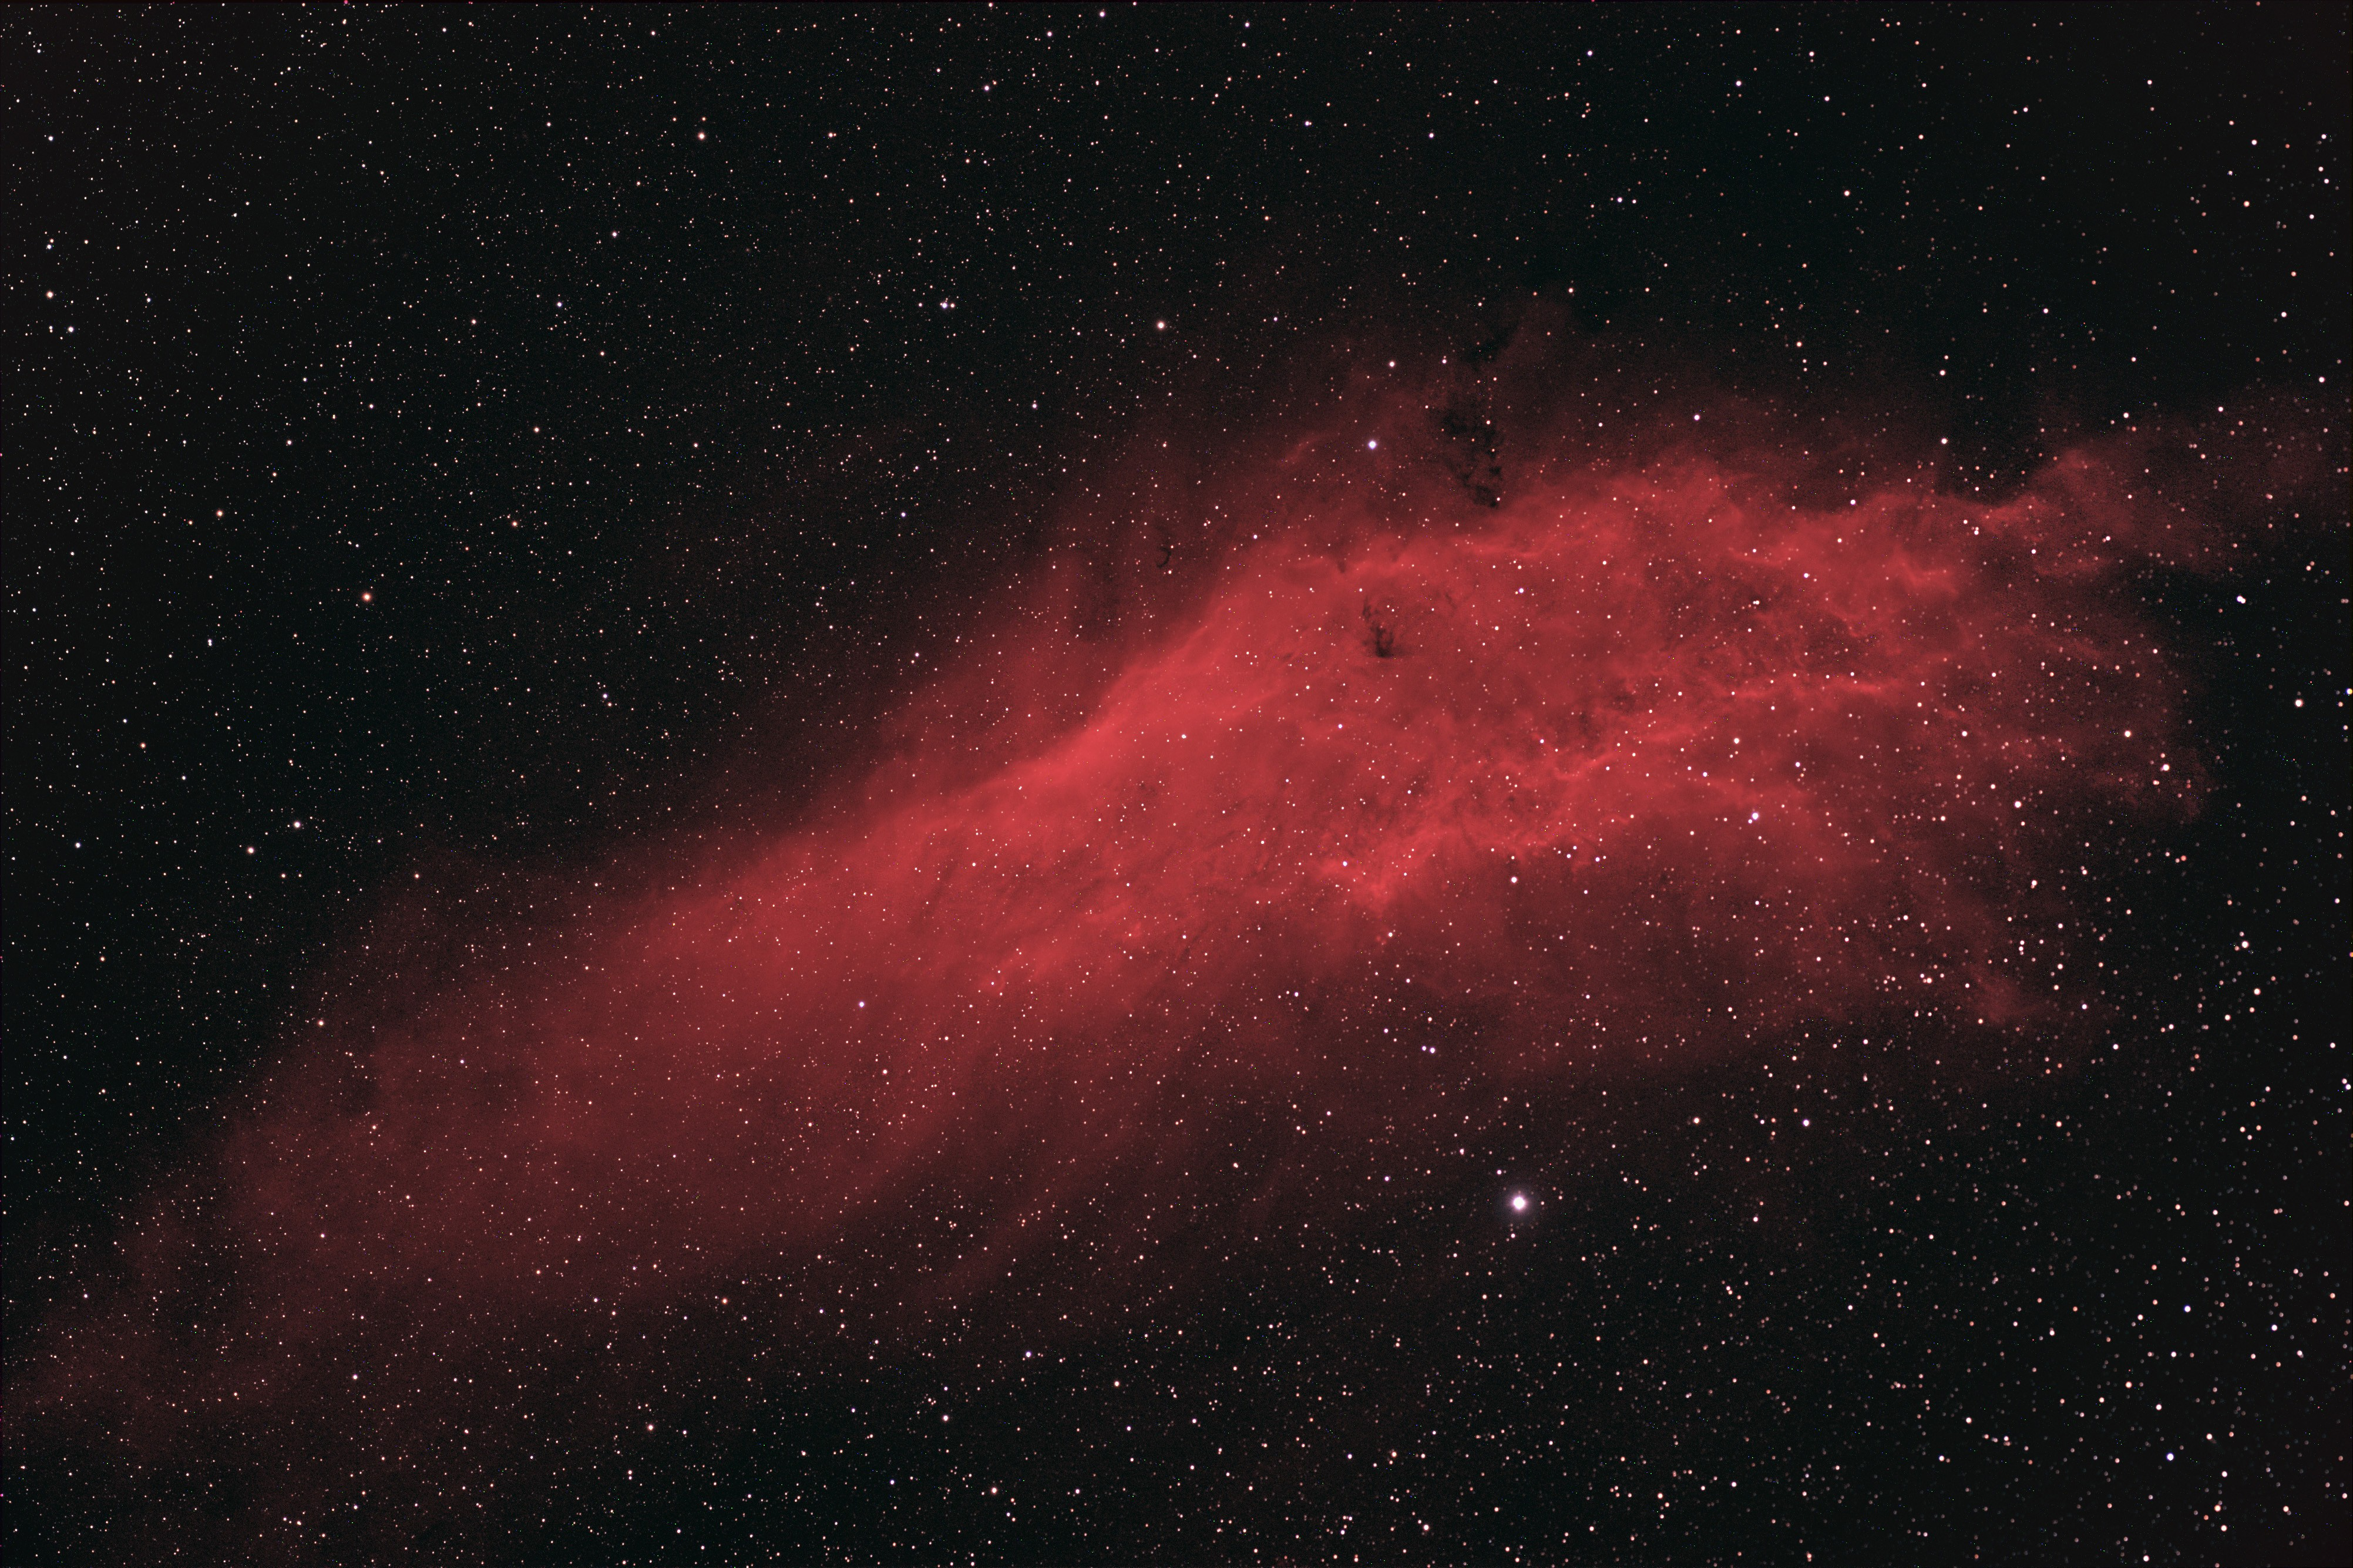 General 4006x2670 space galaxy stars space art digital art red